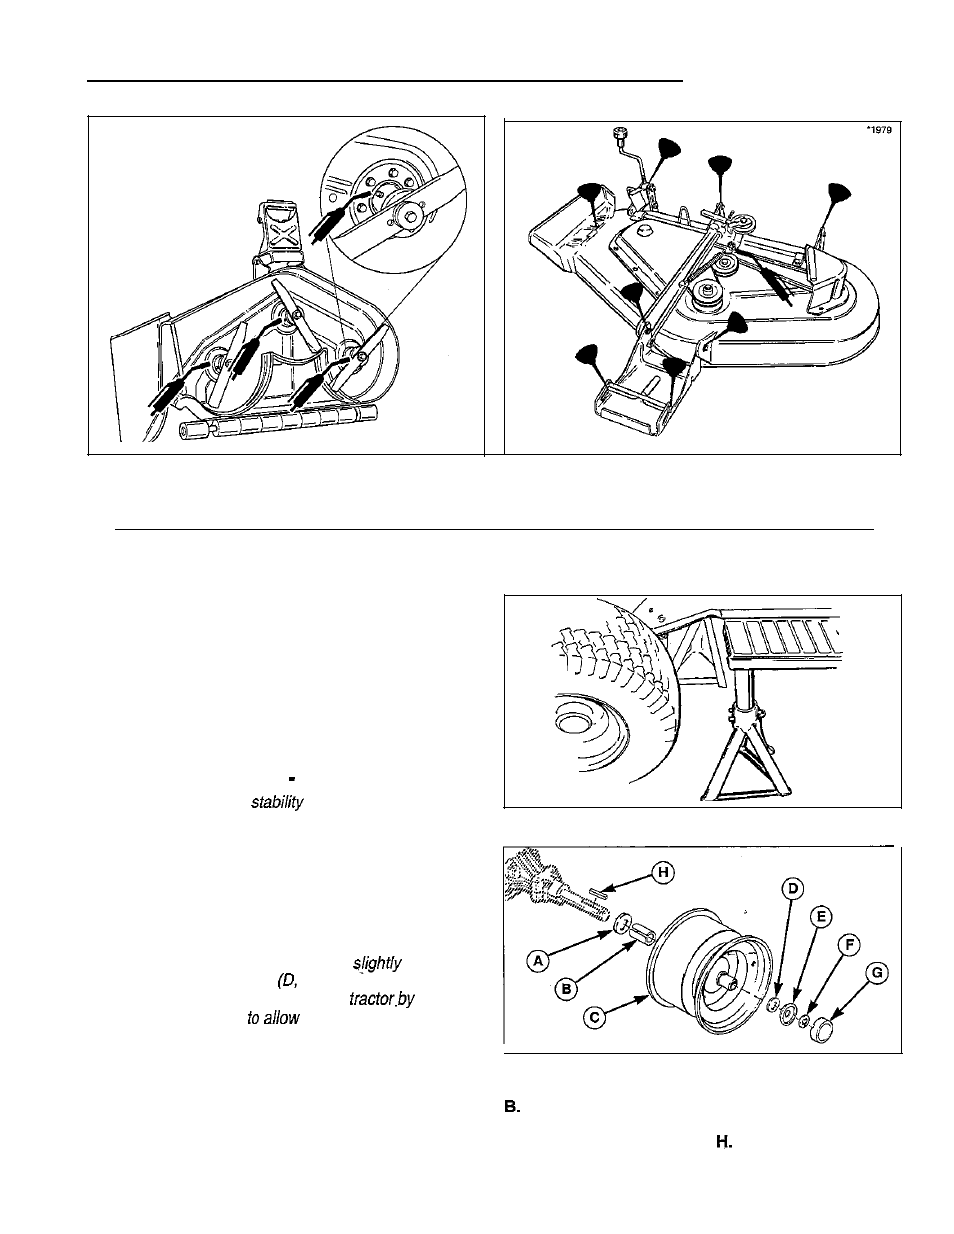 Regular Maintenance  Lubricate Rear Axles